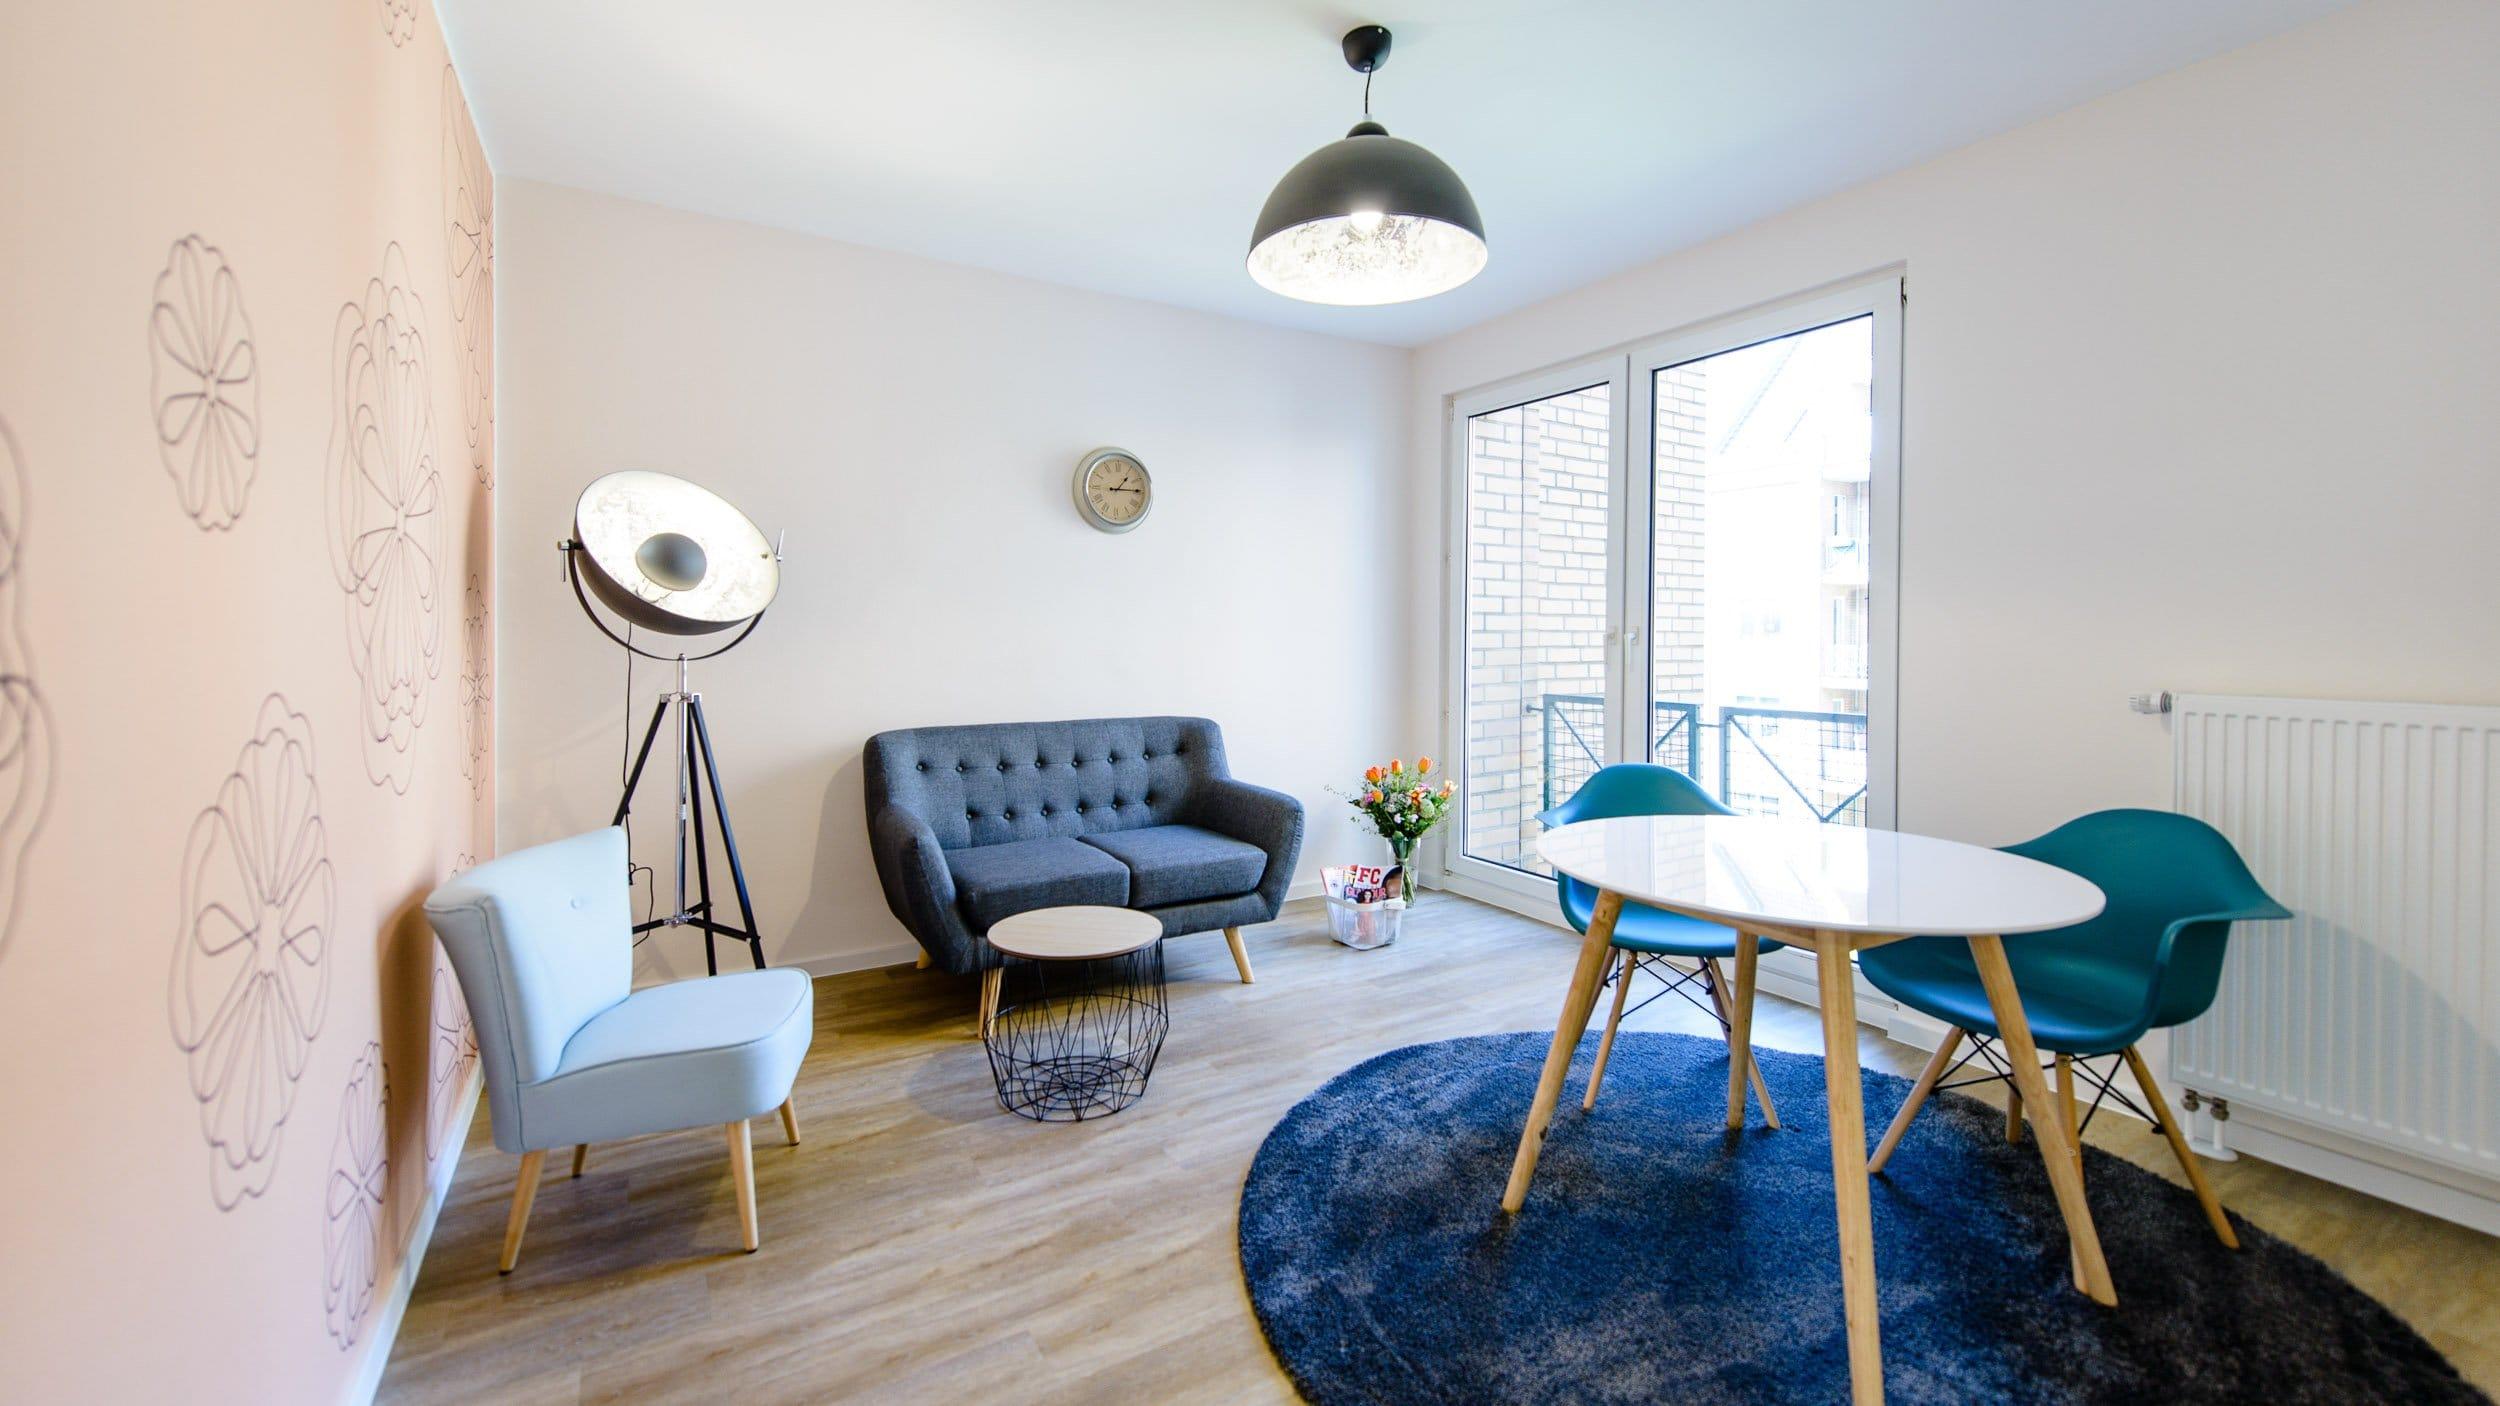 08 zahnarztpraxis fotoshooting k ln fotografen aus k ln. Black Bedroom Furniture Sets. Home Design Ideas